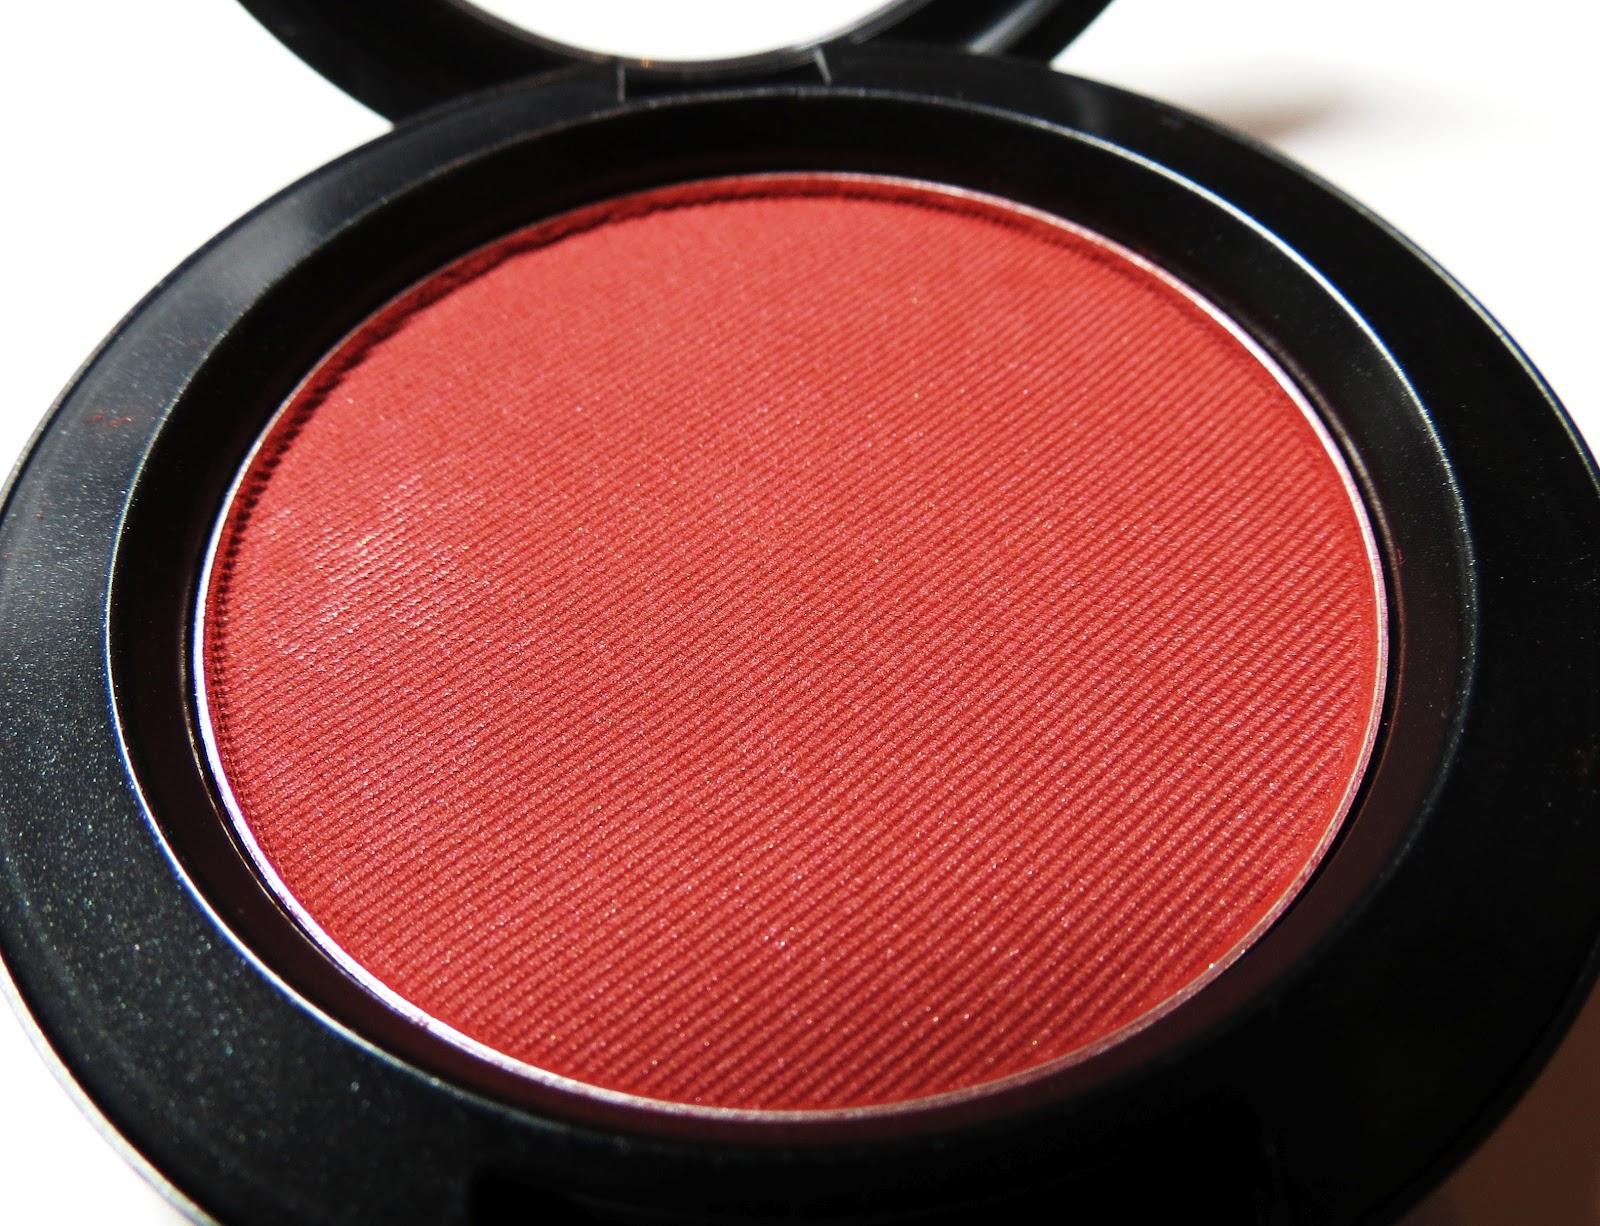 Mac Gadabout Girl nail lacquer | makeup | Pinterest